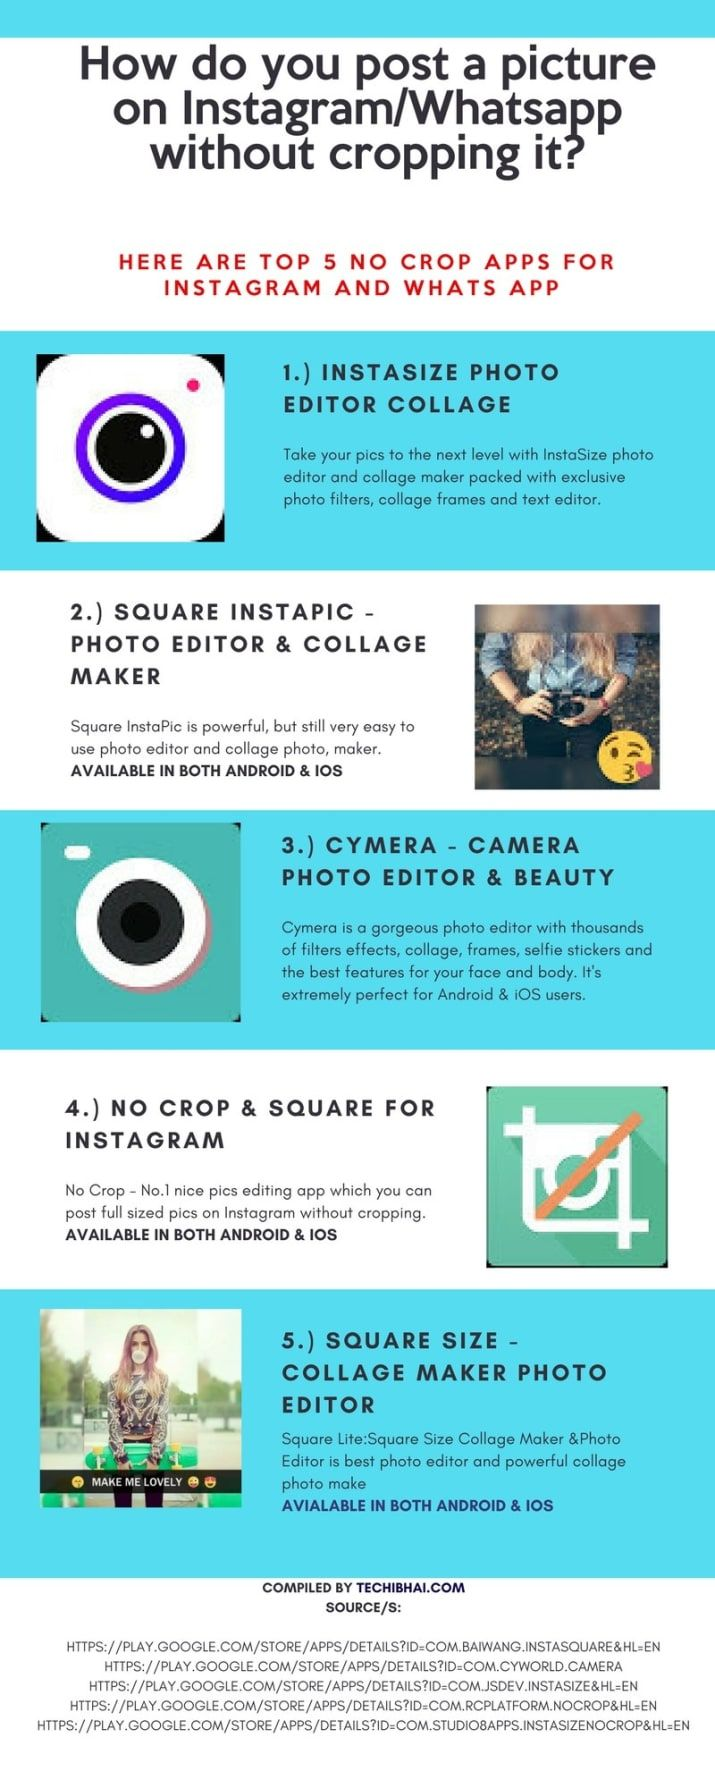 5 Best No Crop Apps For Instagram And WhatsApp Instagram